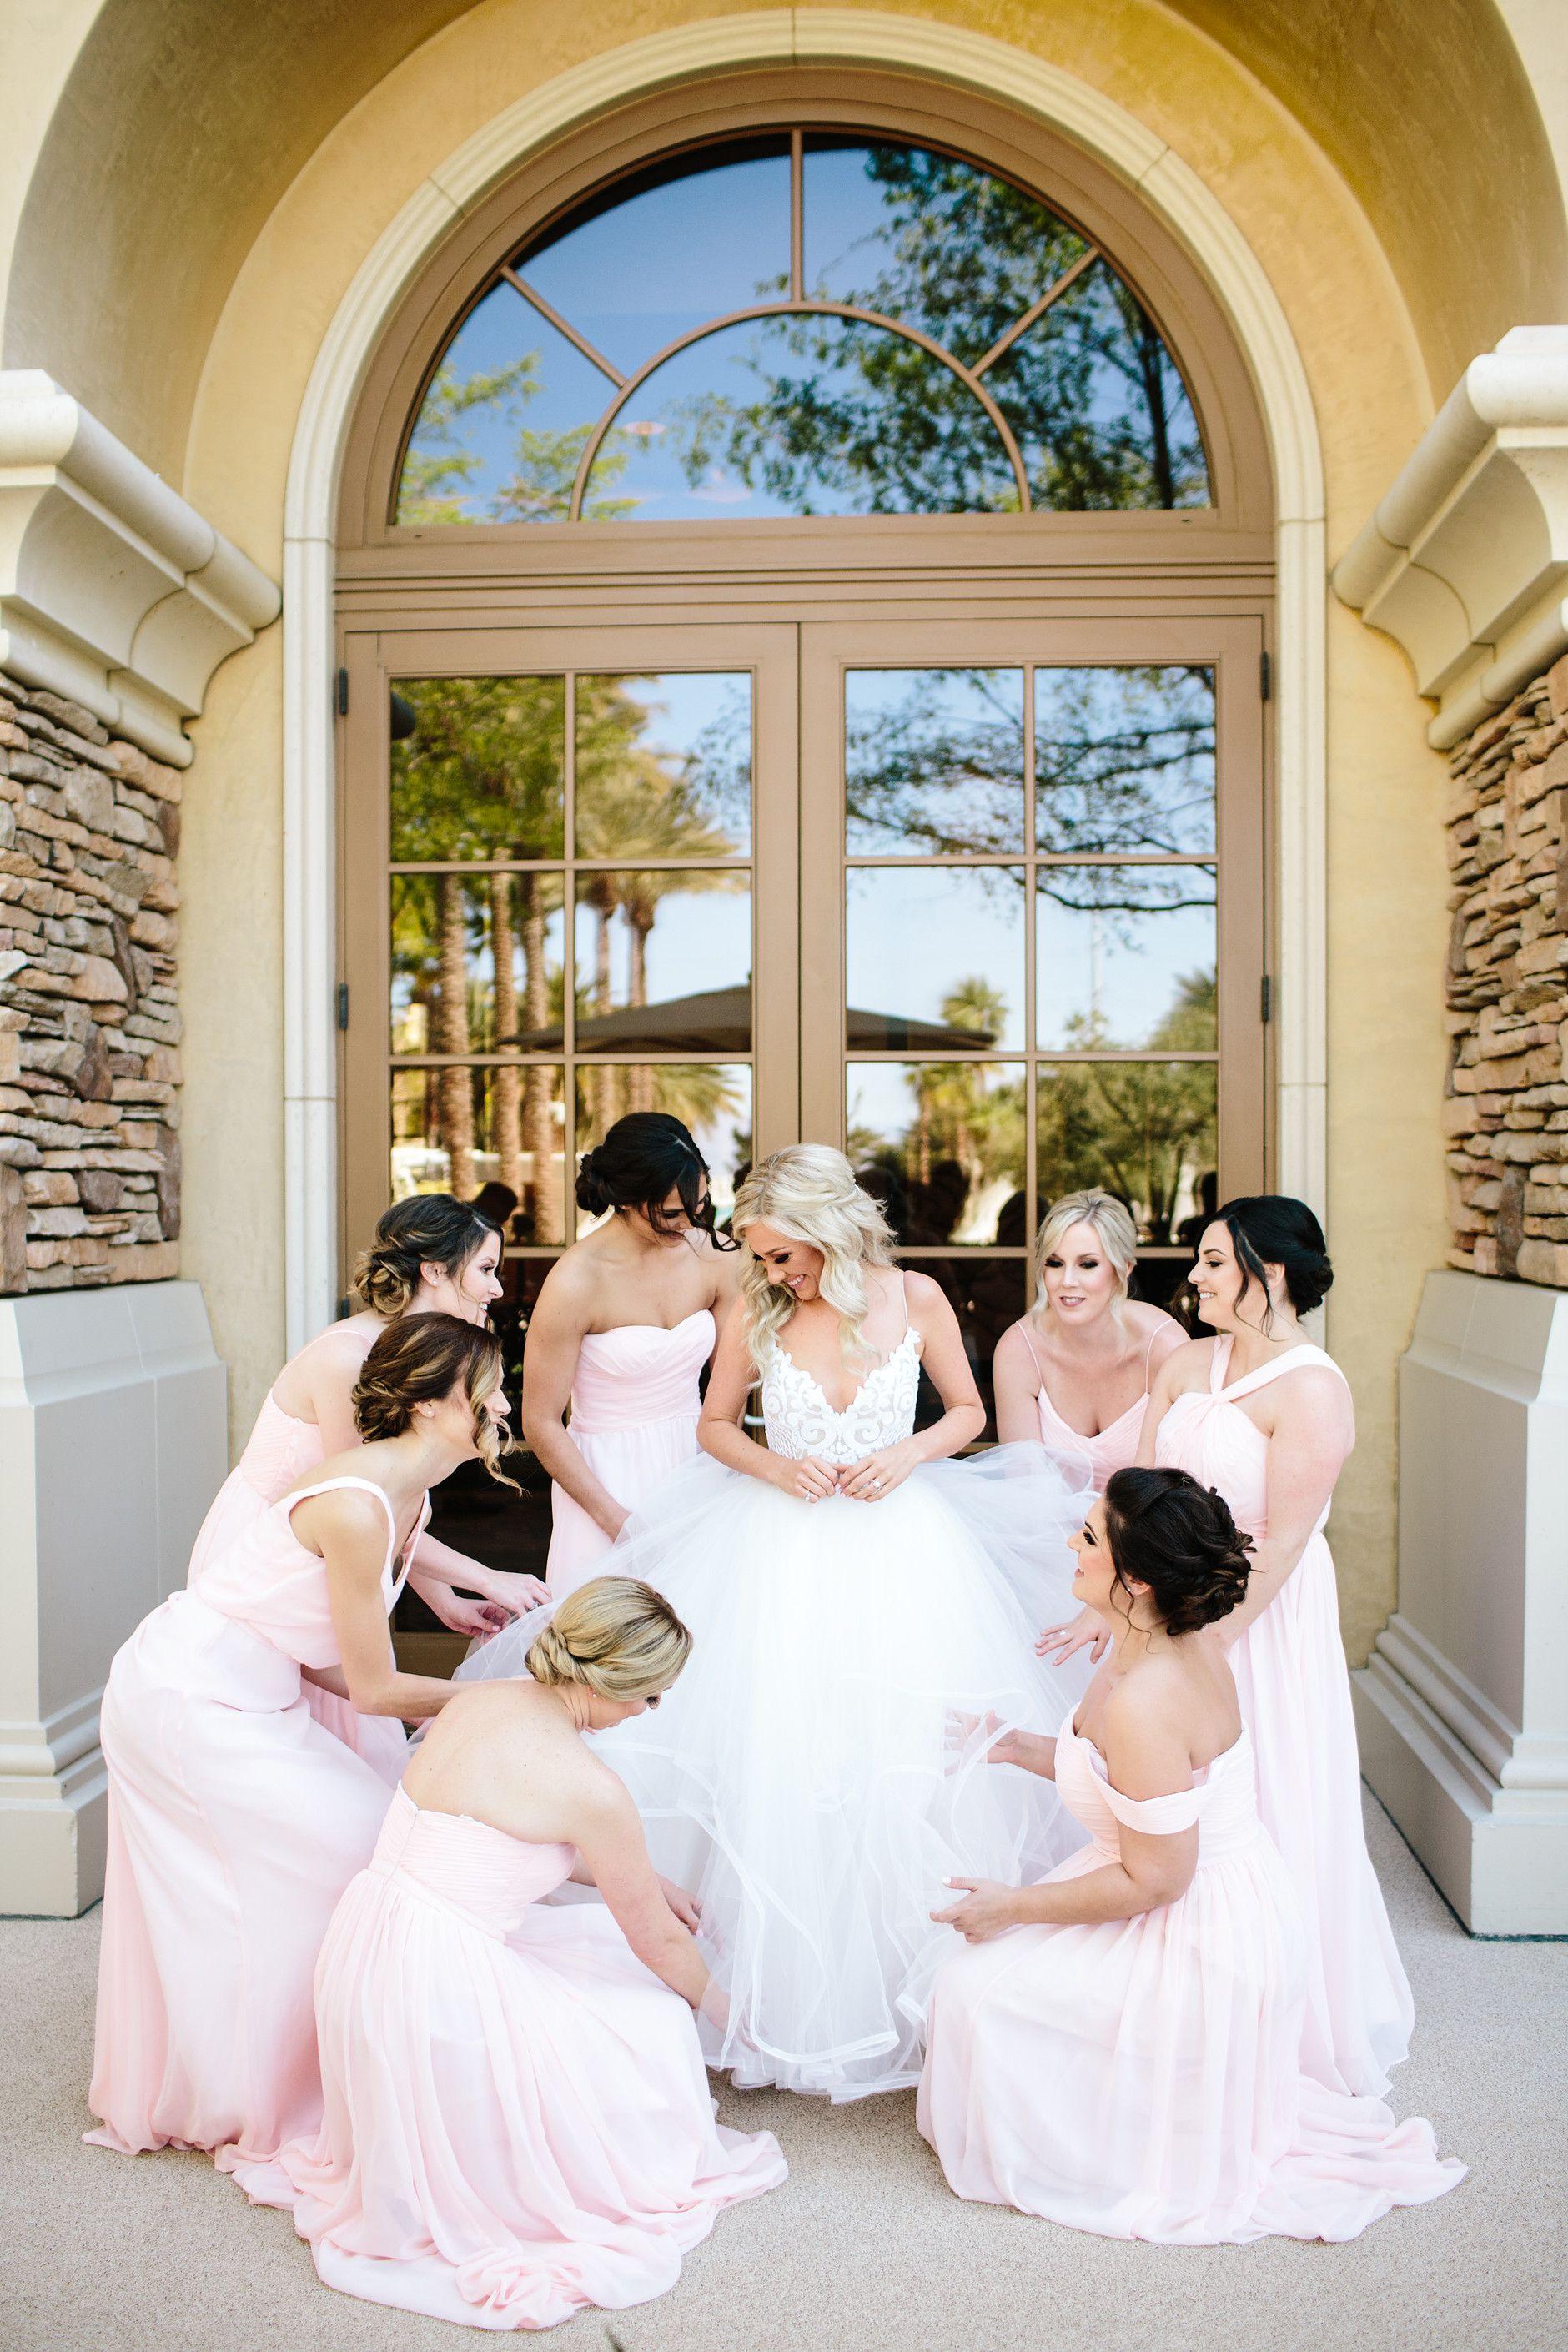 Hayley paige dress las vegas wedding planner revere country club